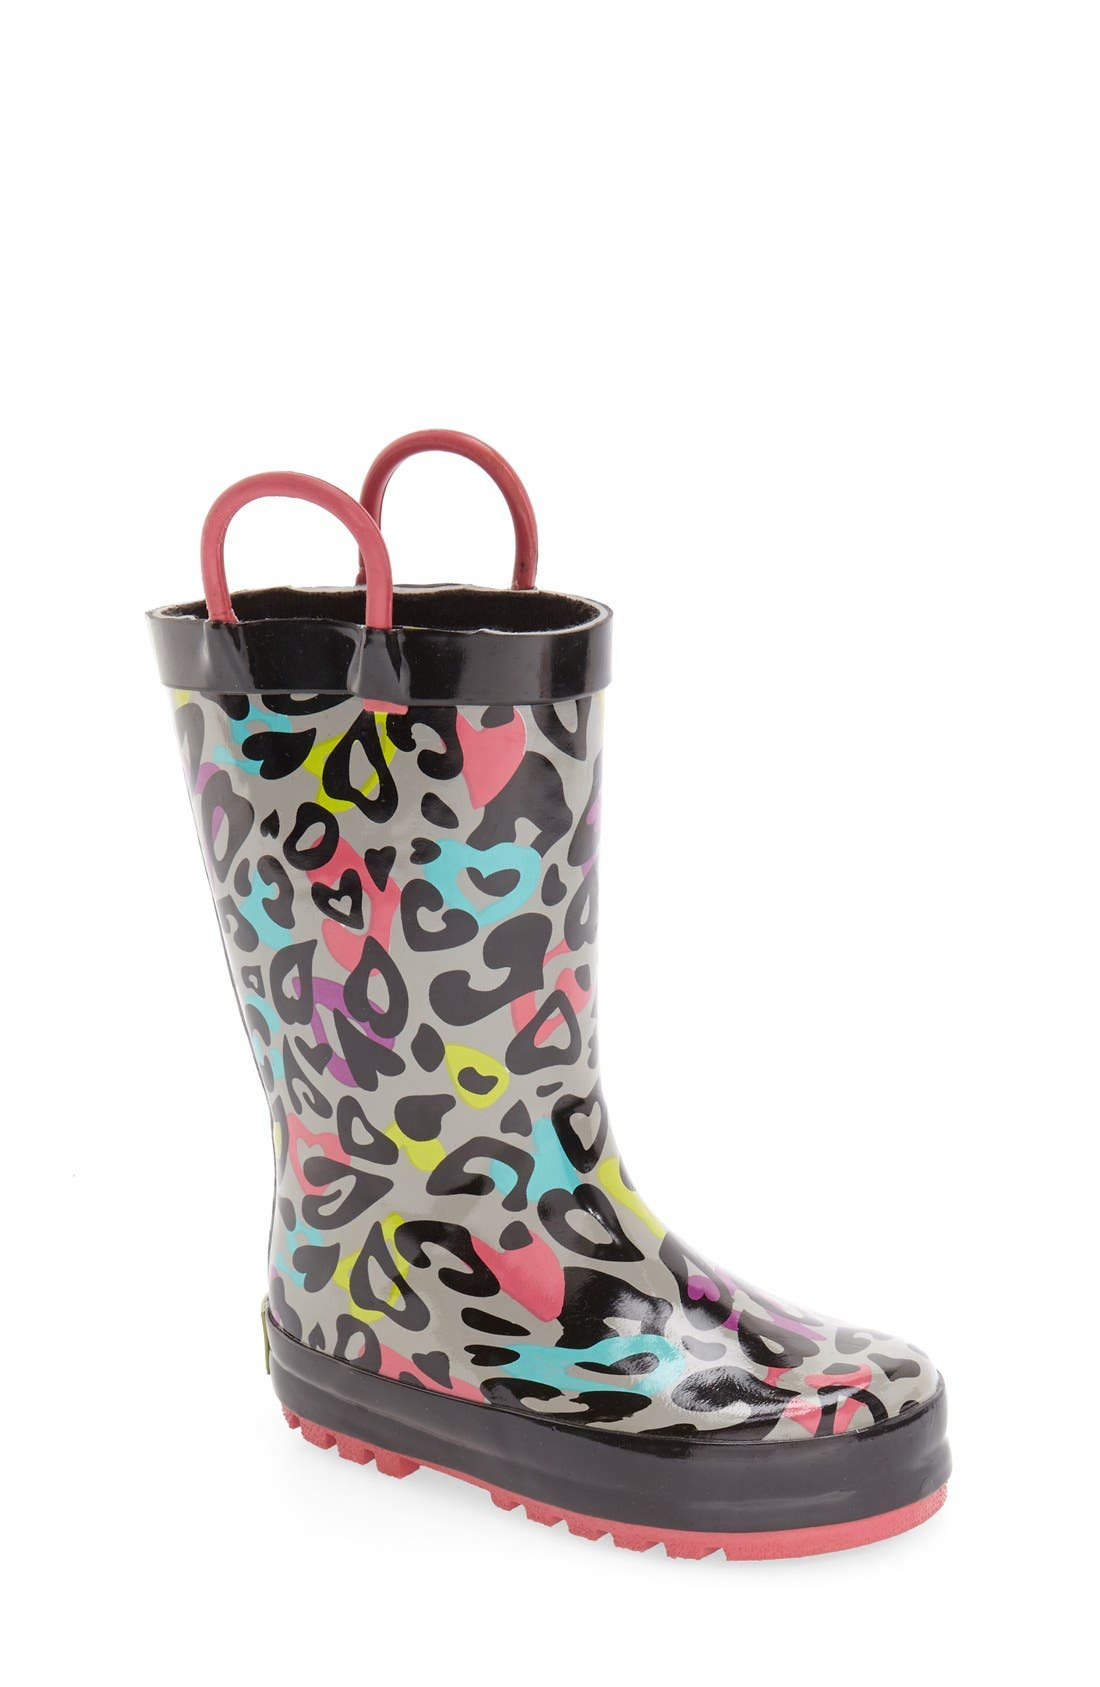 Groovy Leopard Rain Boot,                             Main thumbnail 1, color,                             BLACK